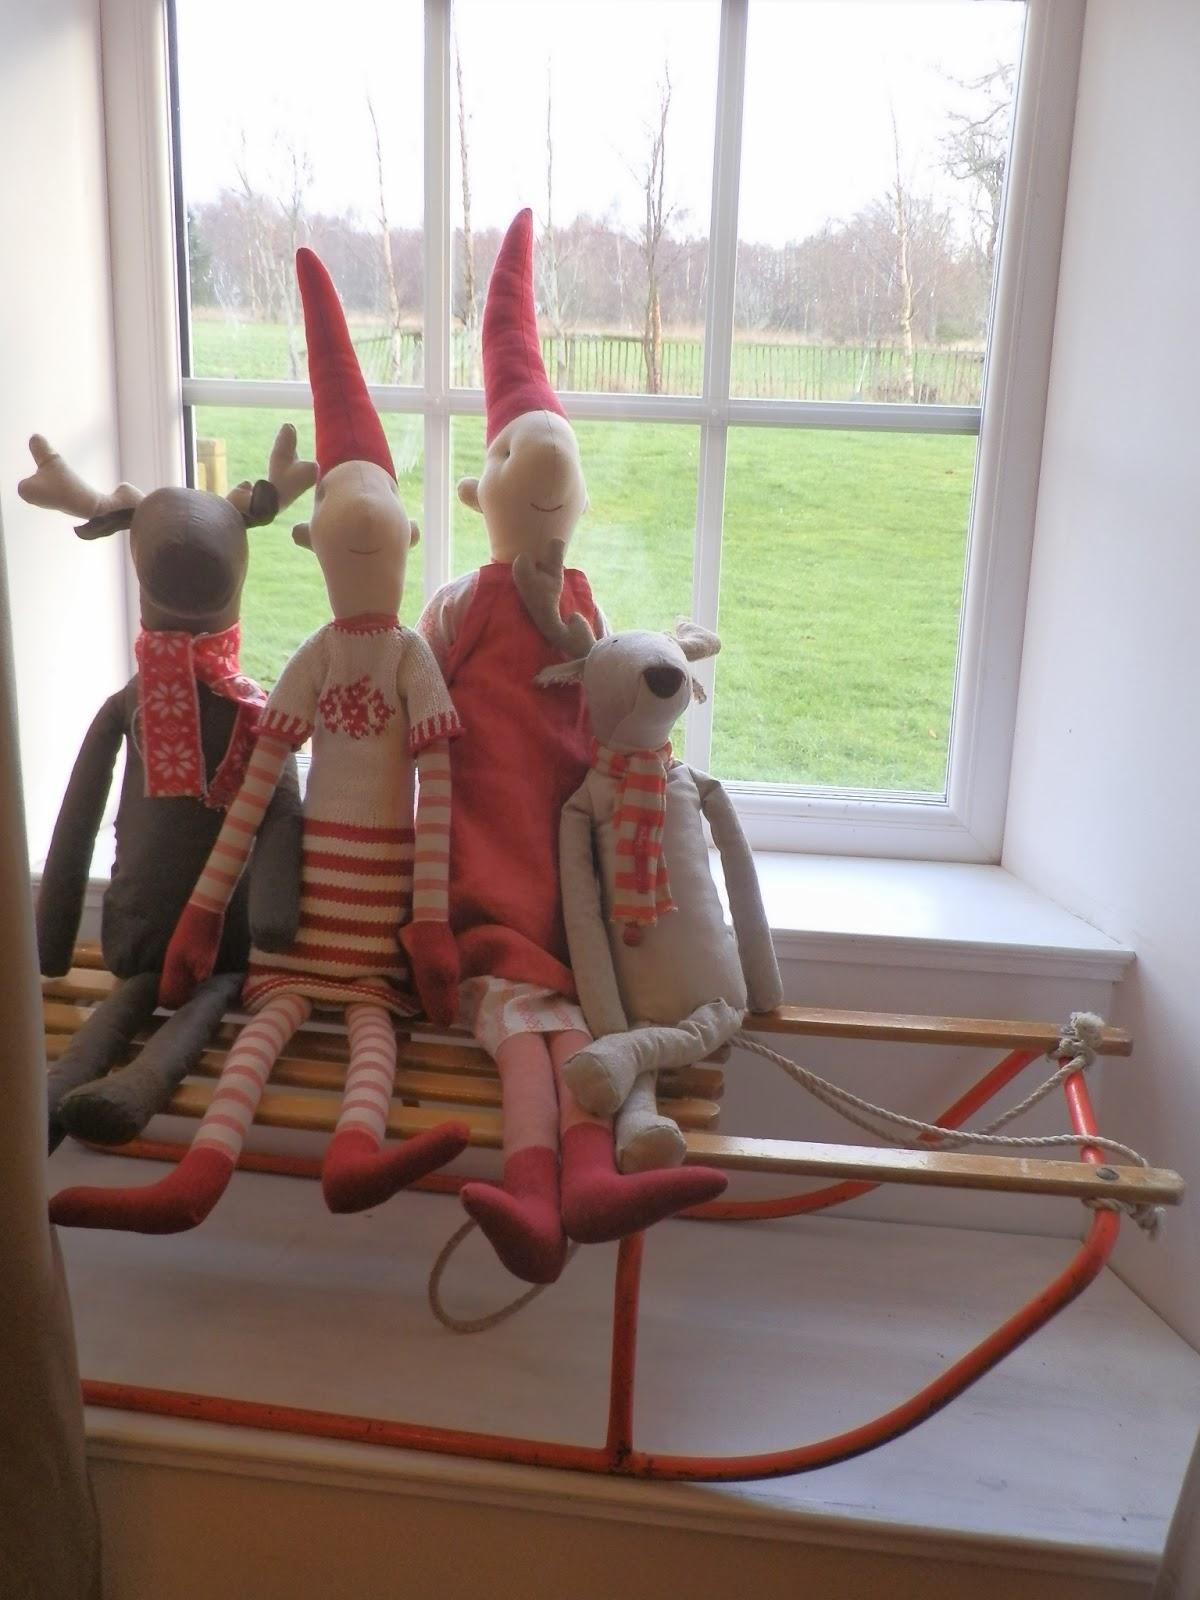 crazy sofa ride hamilton gallery tysons corner a bonnie life in the country christmas farmhouse